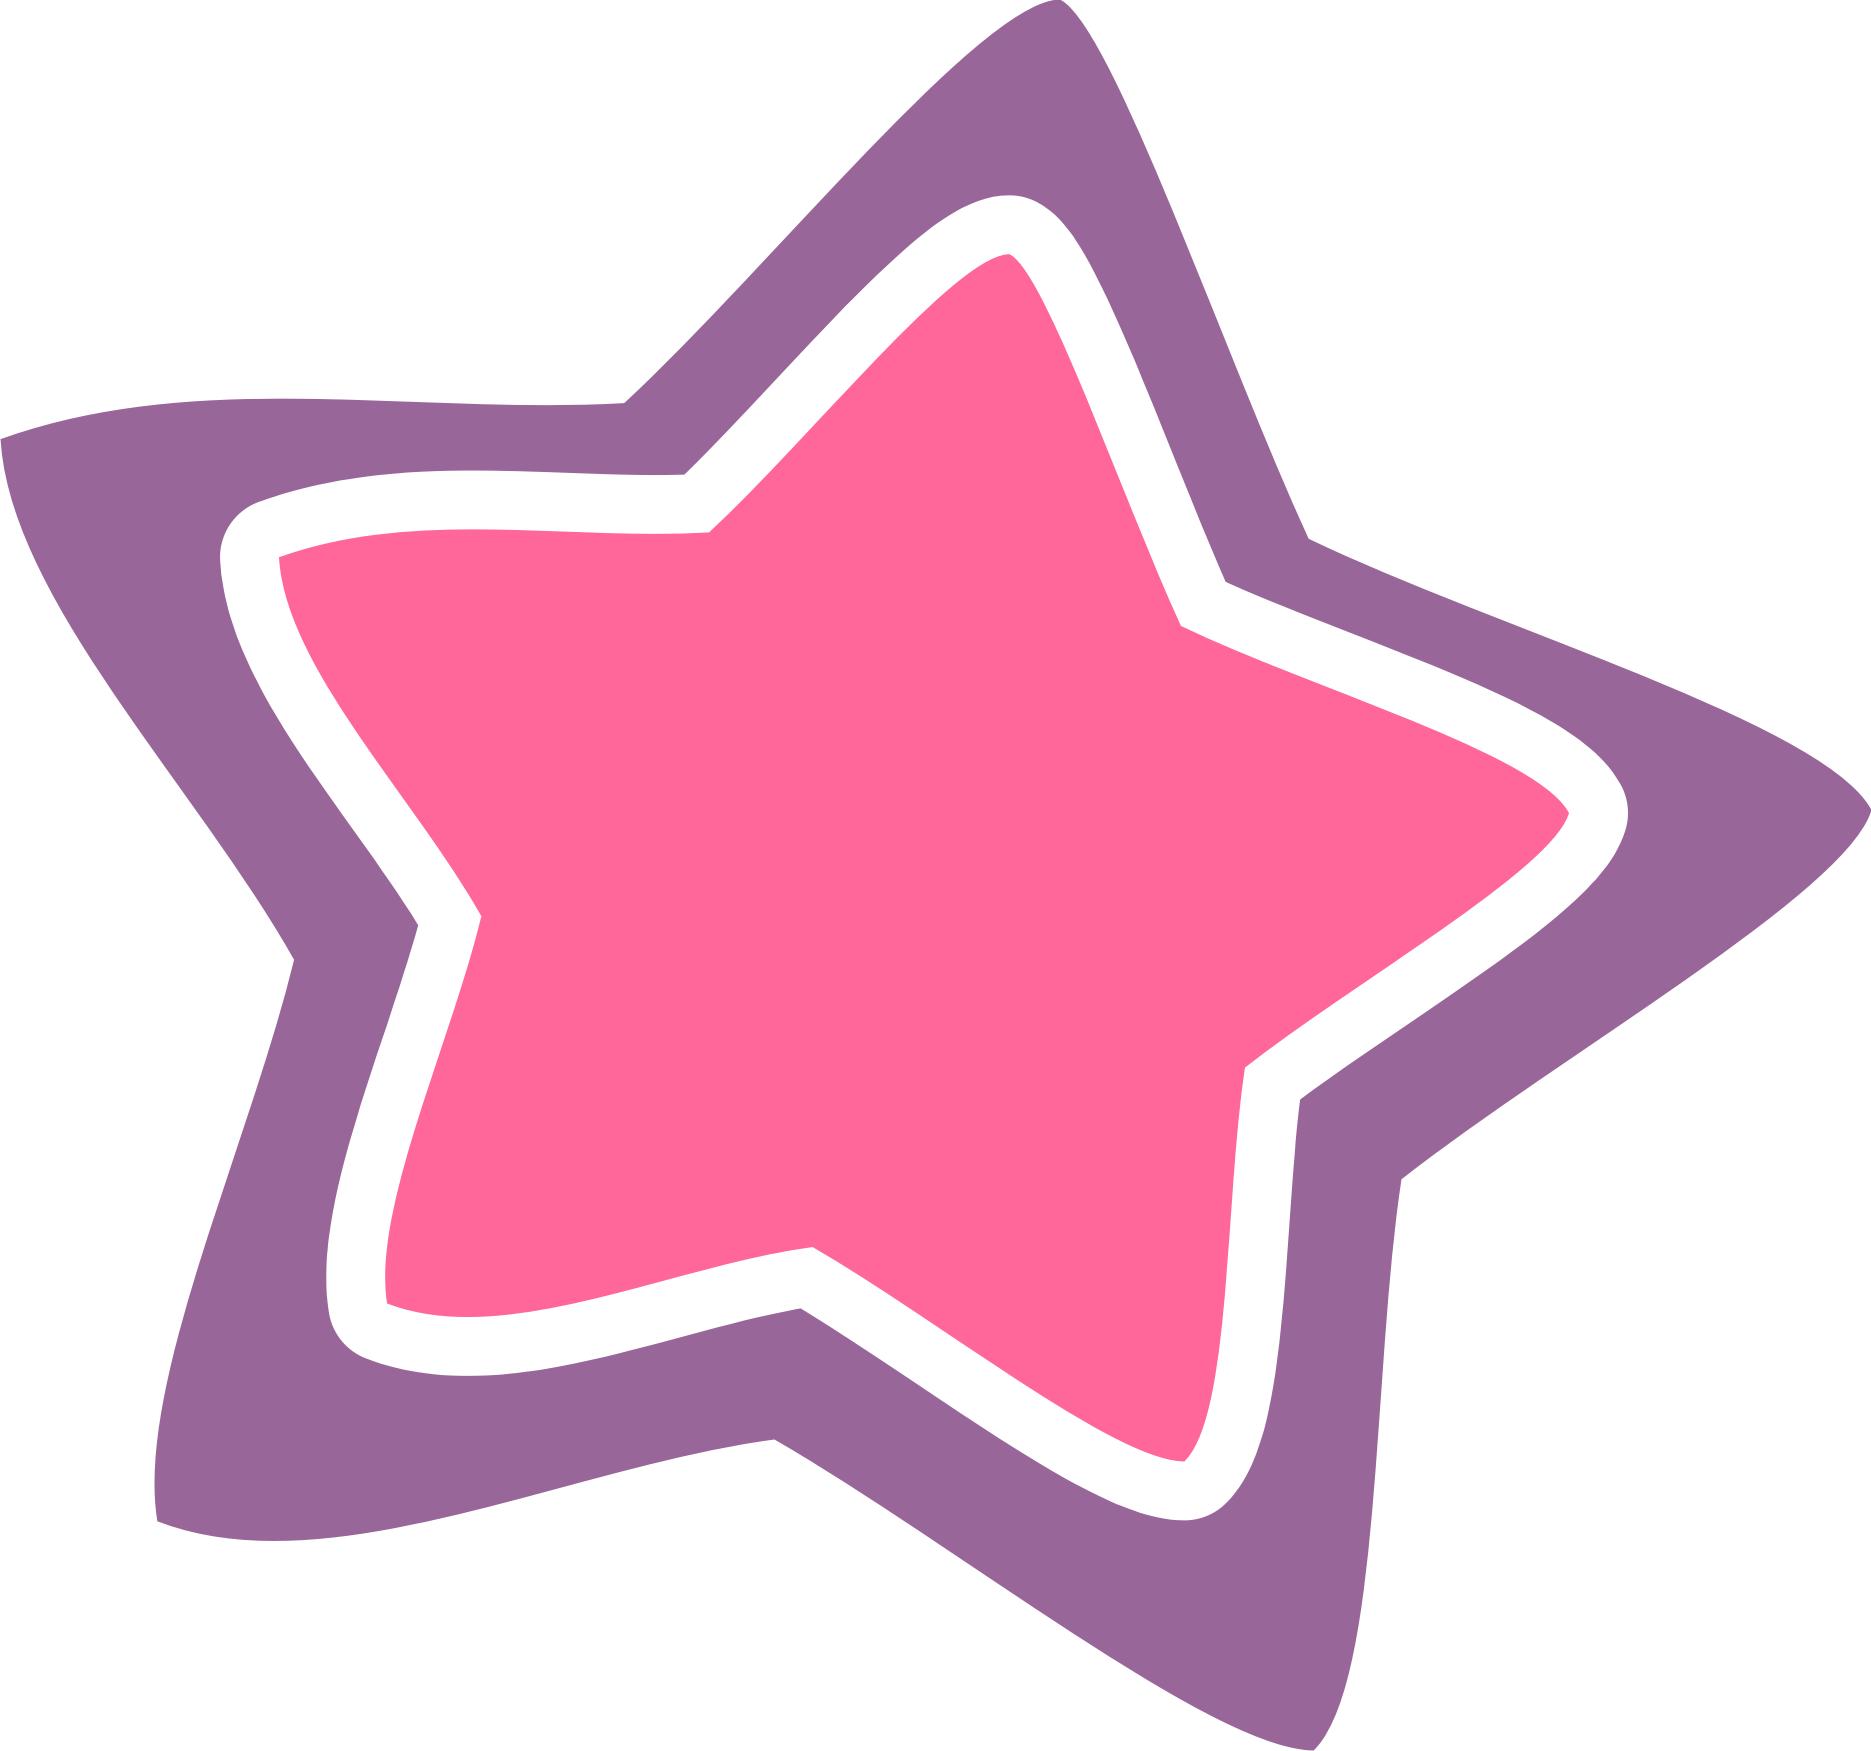 Estrella png spa pinterest. Hairbrush clipart violet thing